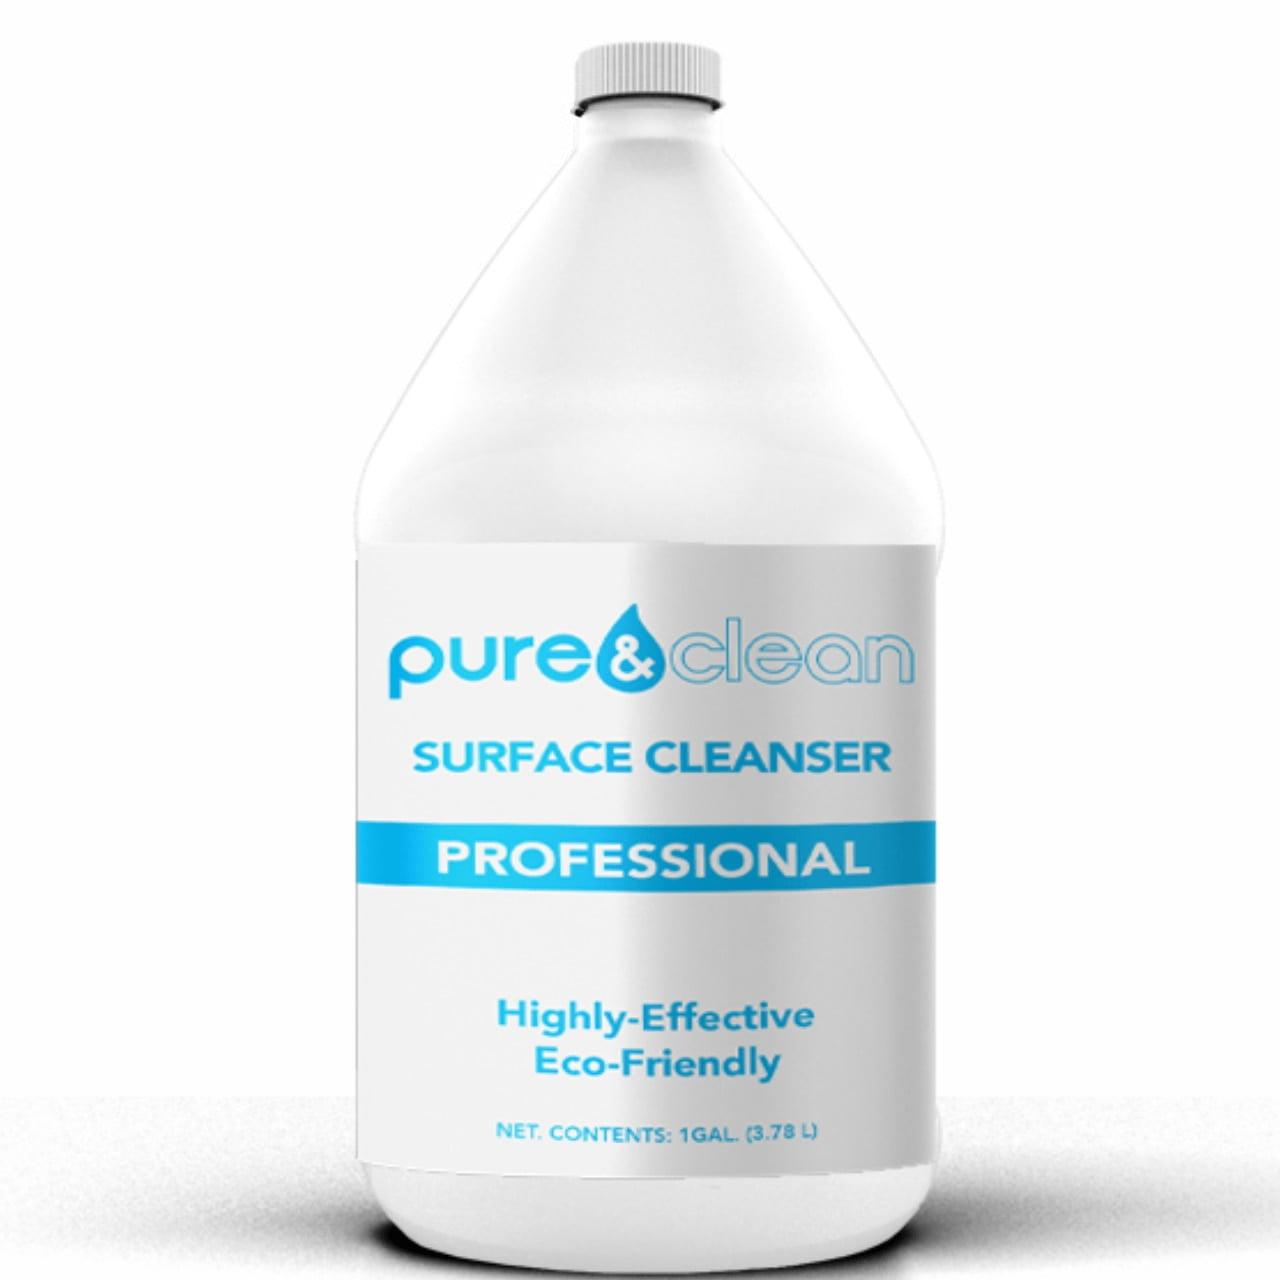 Surface Cleanser Pro (1 gallon) - 300 ppm HOCl